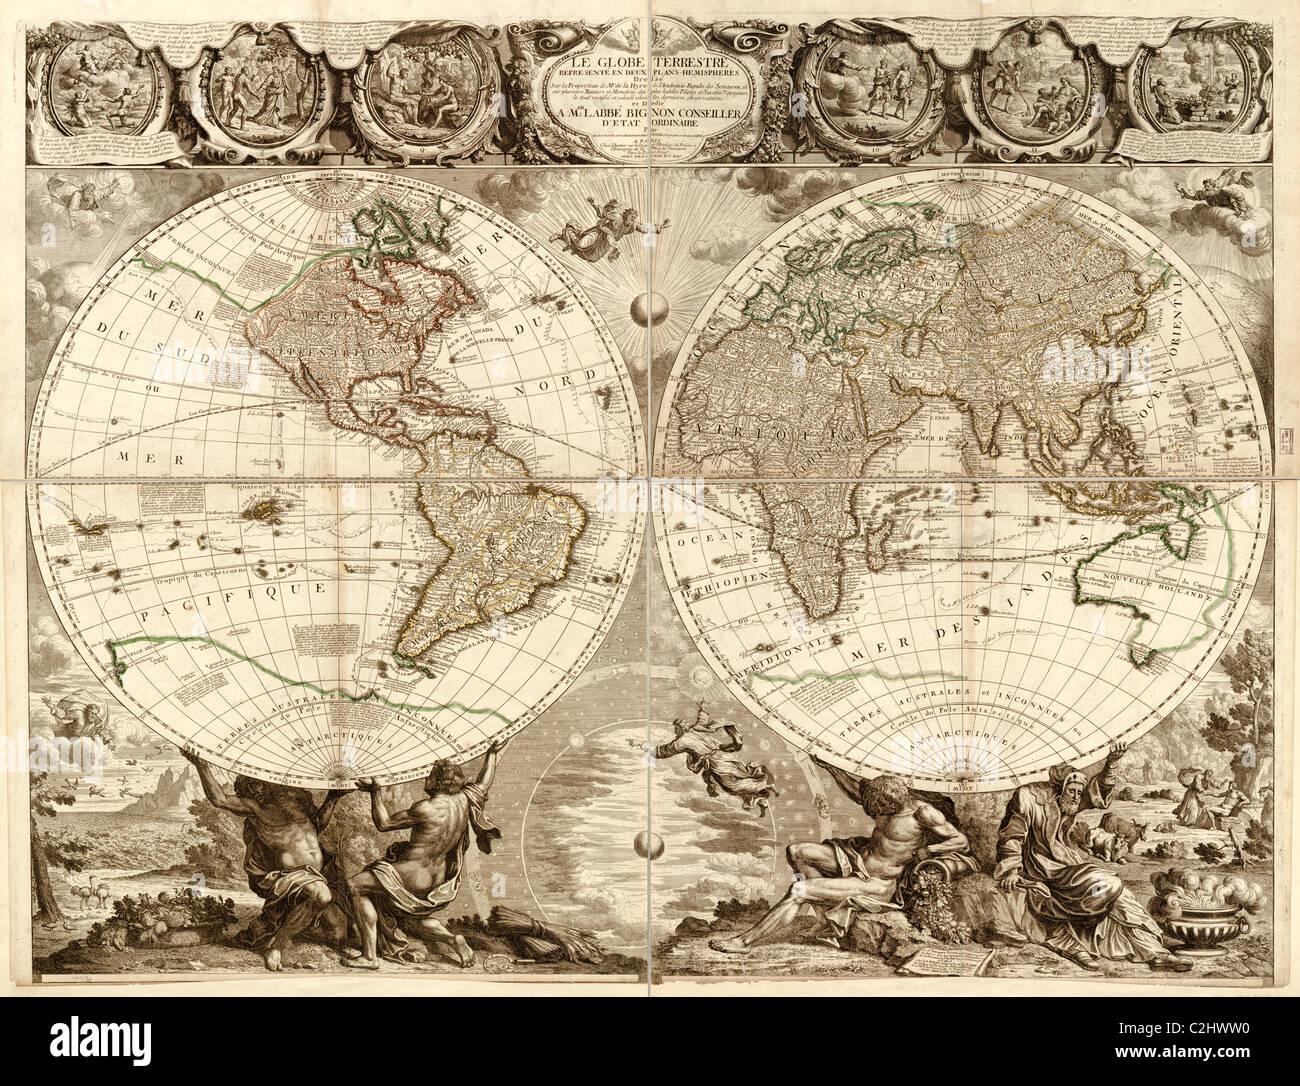 Globe in 1708 - World - Stock Image